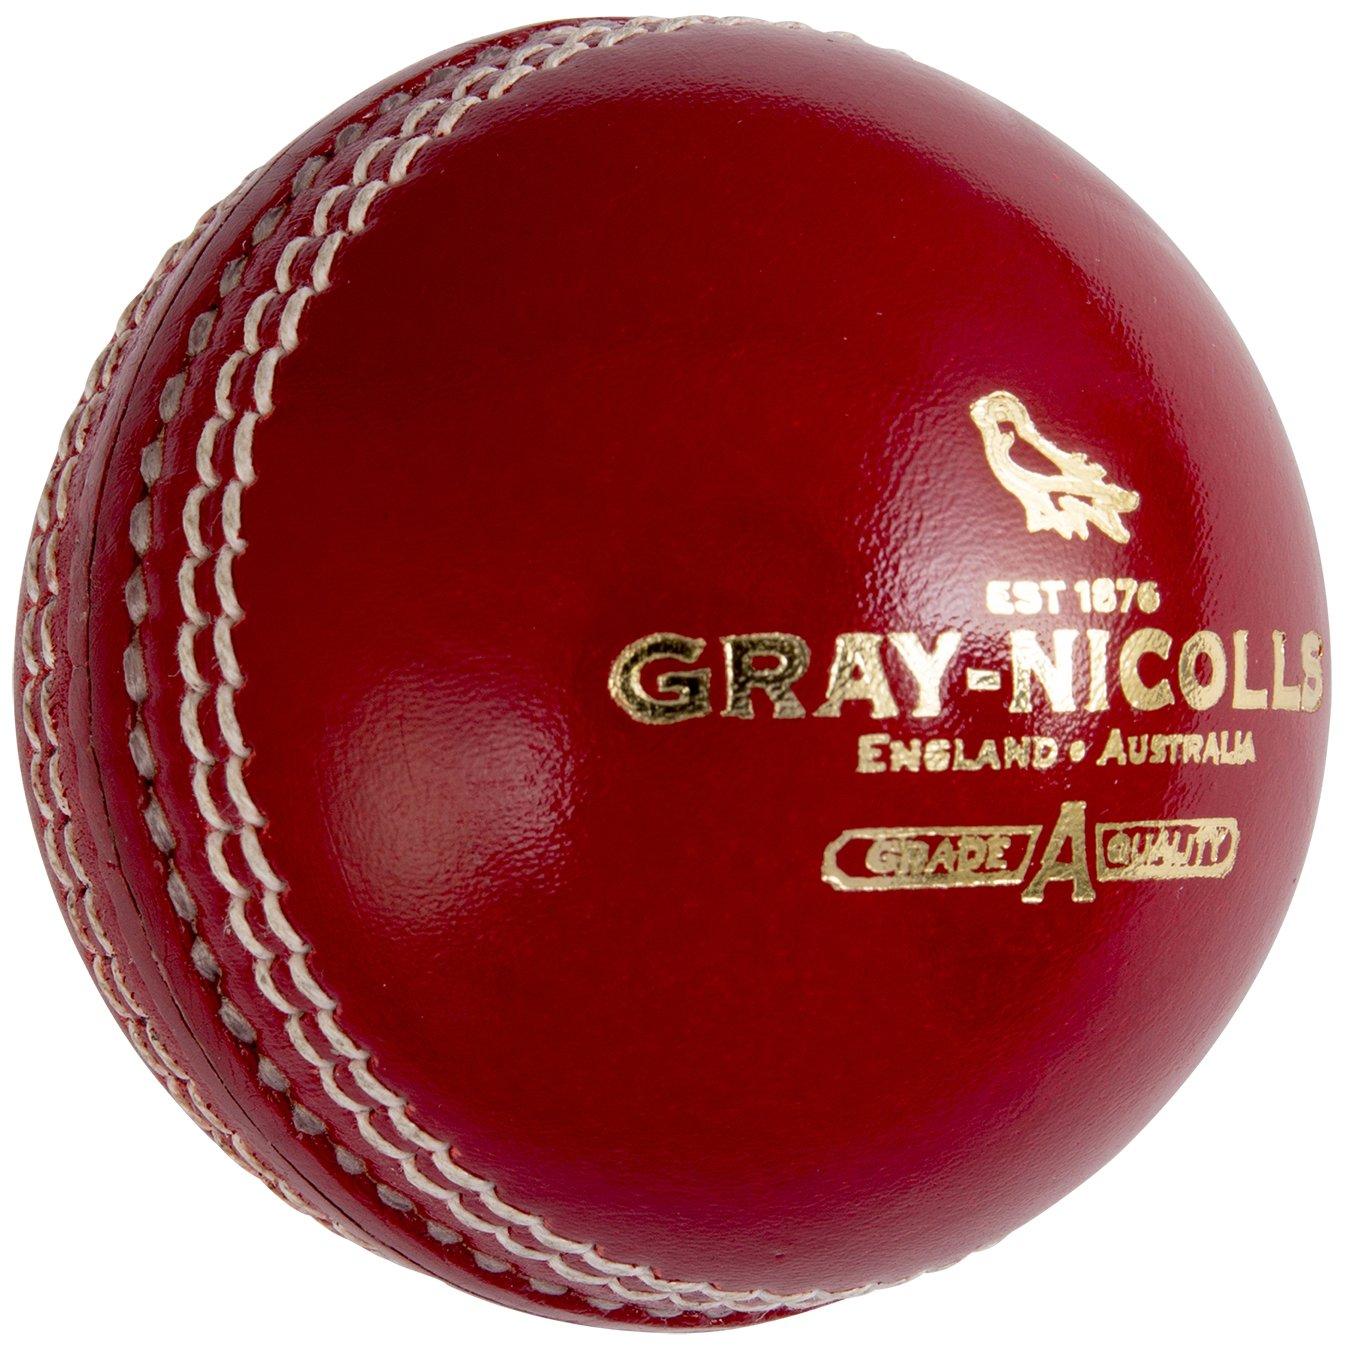 GRAY-NICOLLS Cricket Match Ball _ 4piece Hard Ball and Good Quality